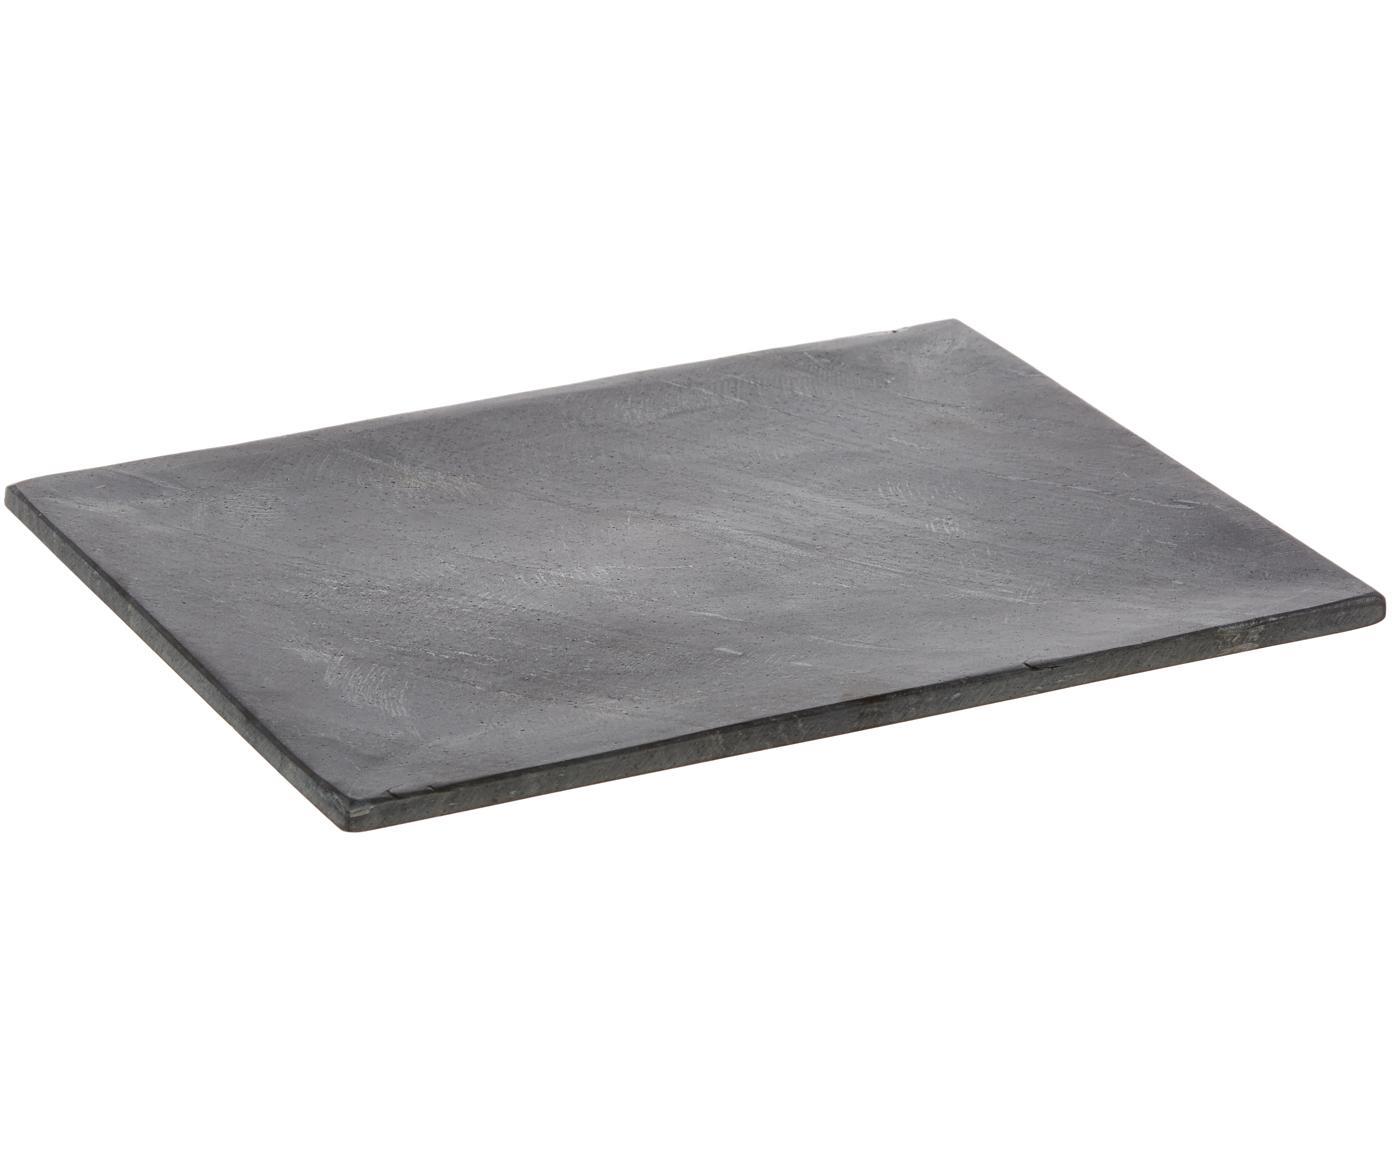 Granieten serveerplateau Klevina, Graniet, Grijs, 28 x 2 cm